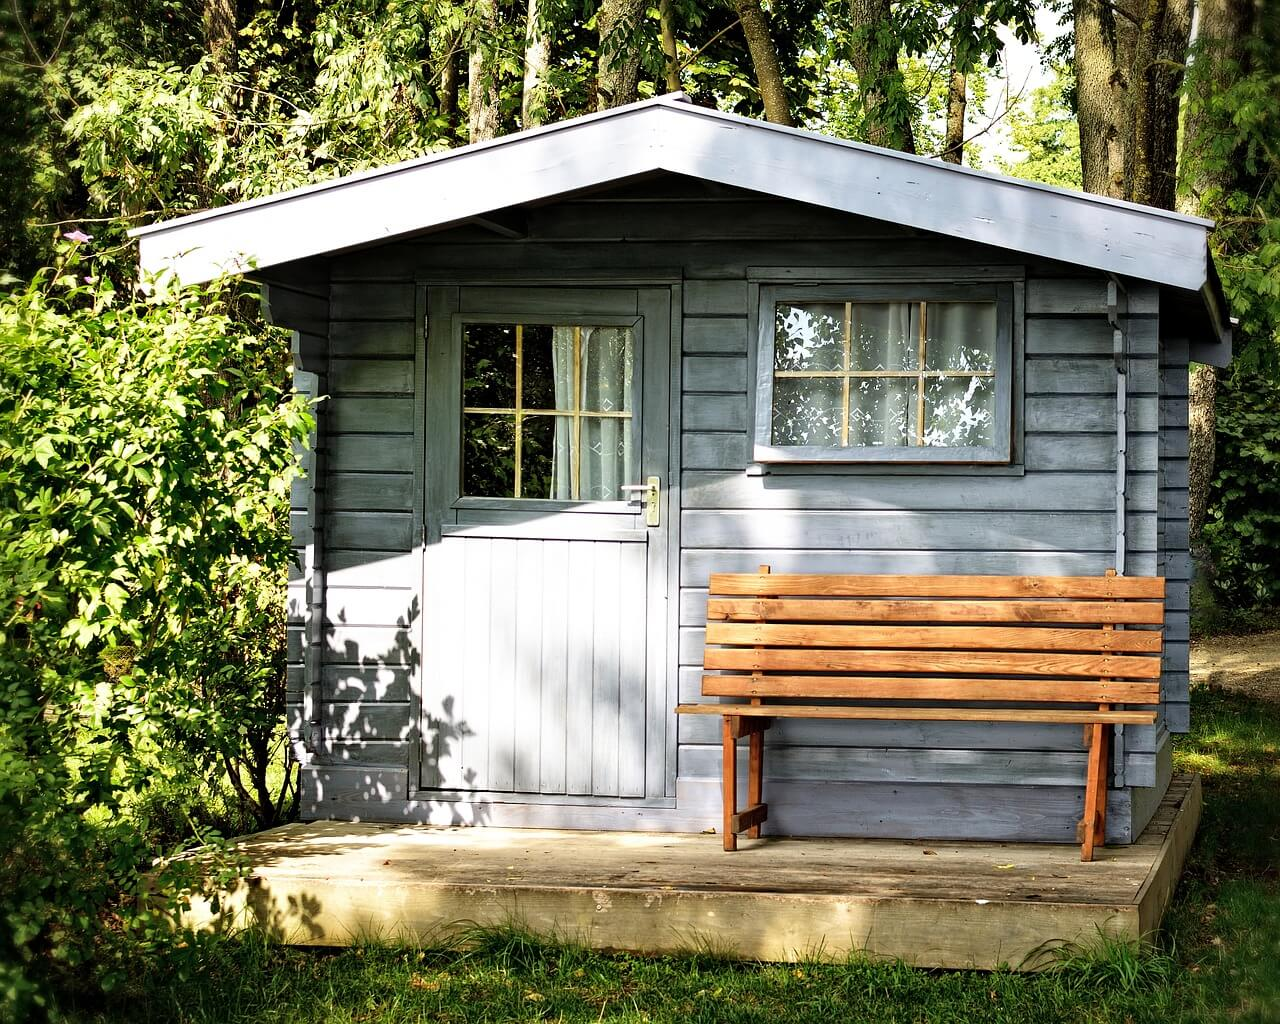 garden shed photo